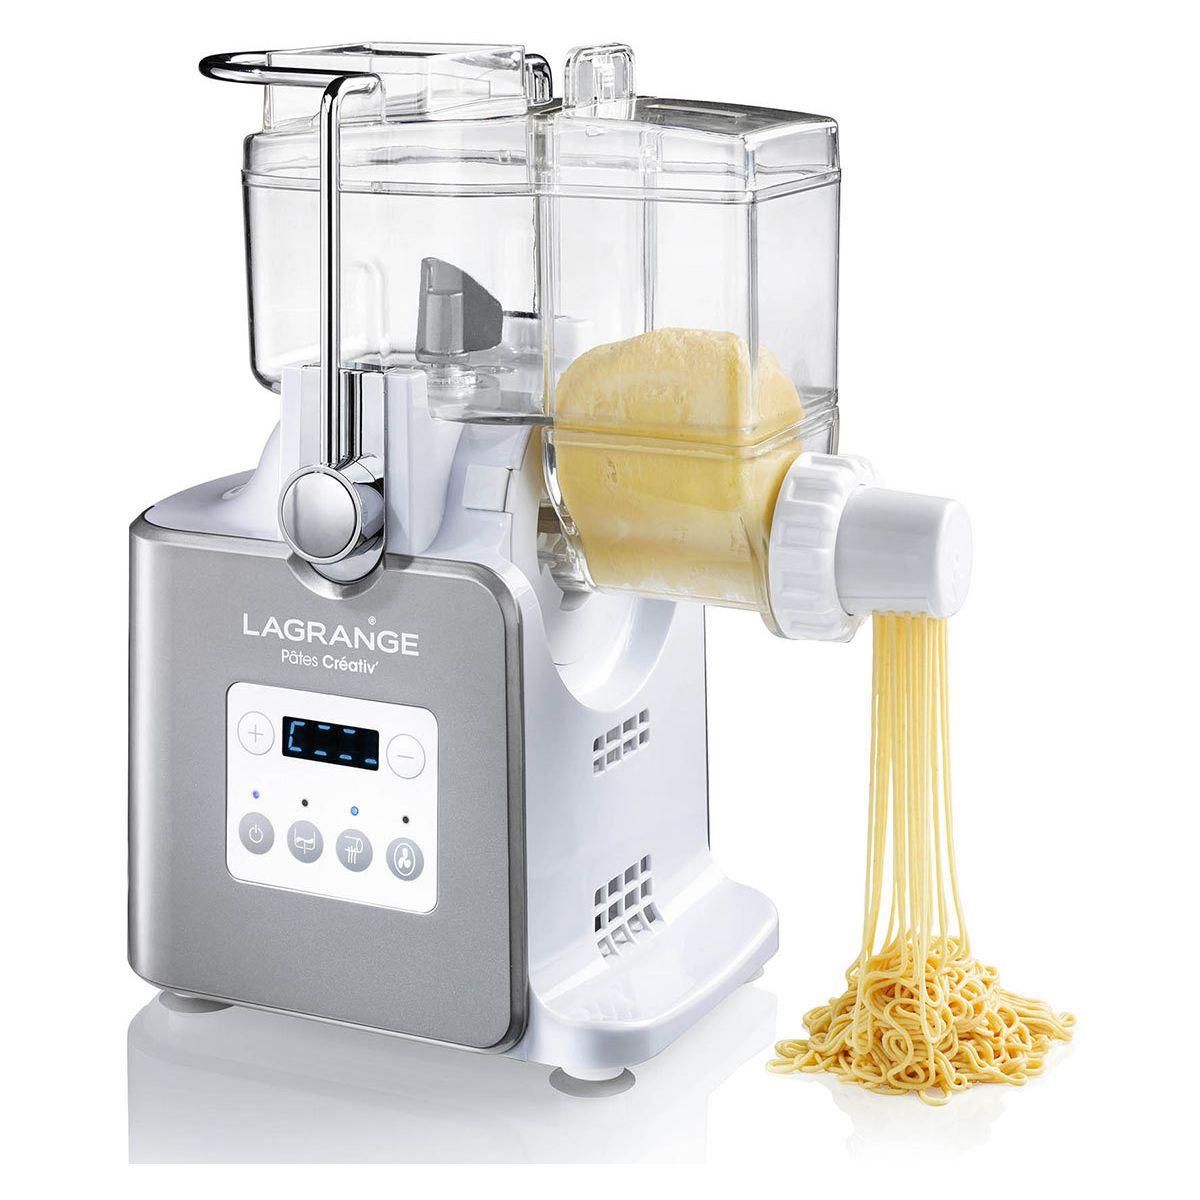 Machine à pâte lagrange pâtes créativ' 429002